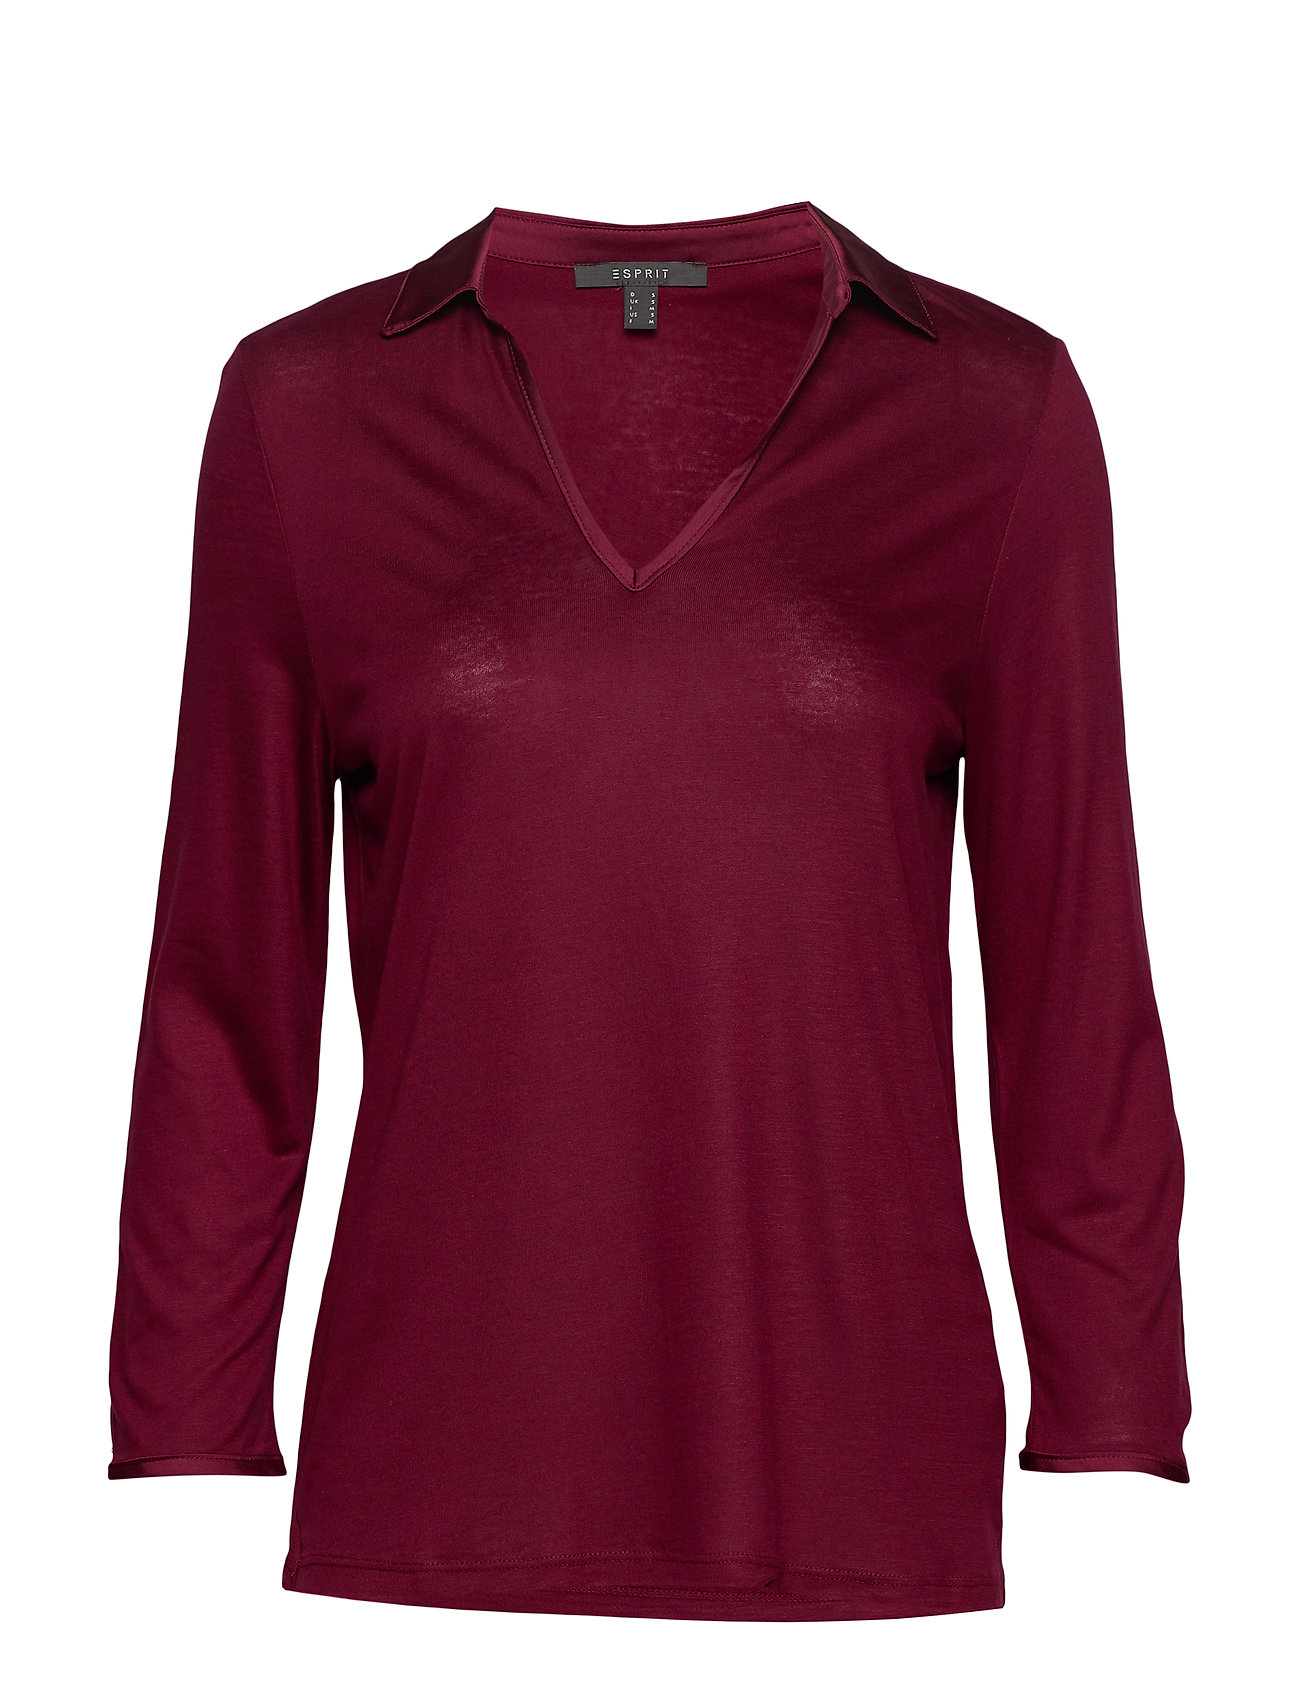 Esprit Collection T-Shirts - GARNET RED